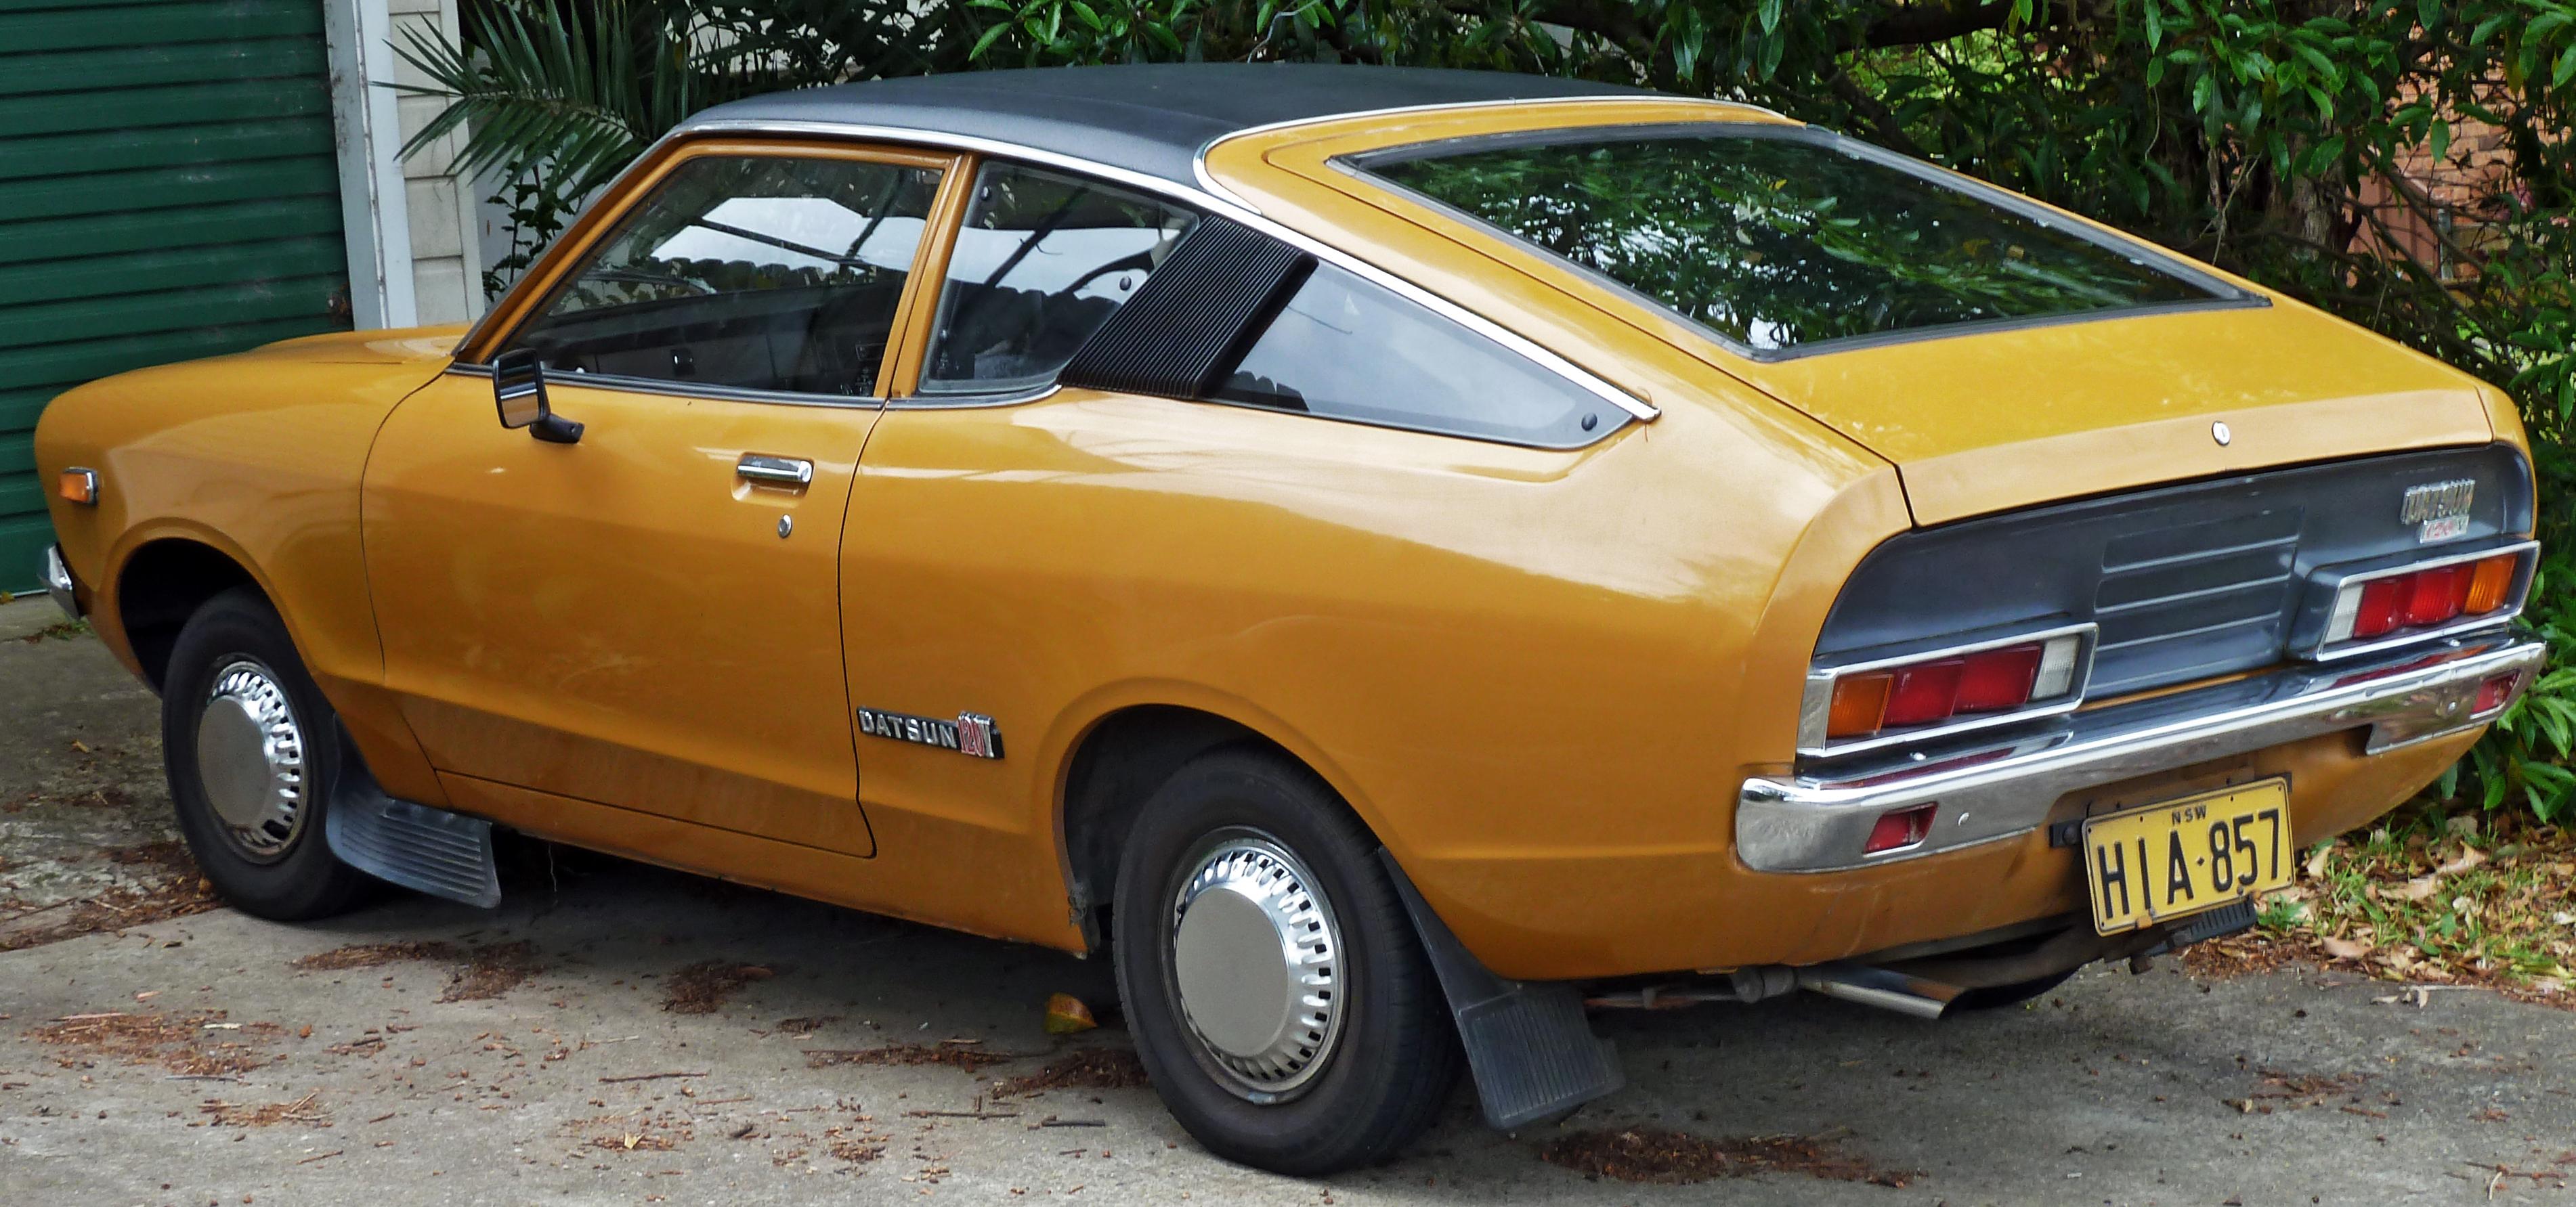 Datsun 120Y Coup: Photos, Reviews, News, Specs, Buy car